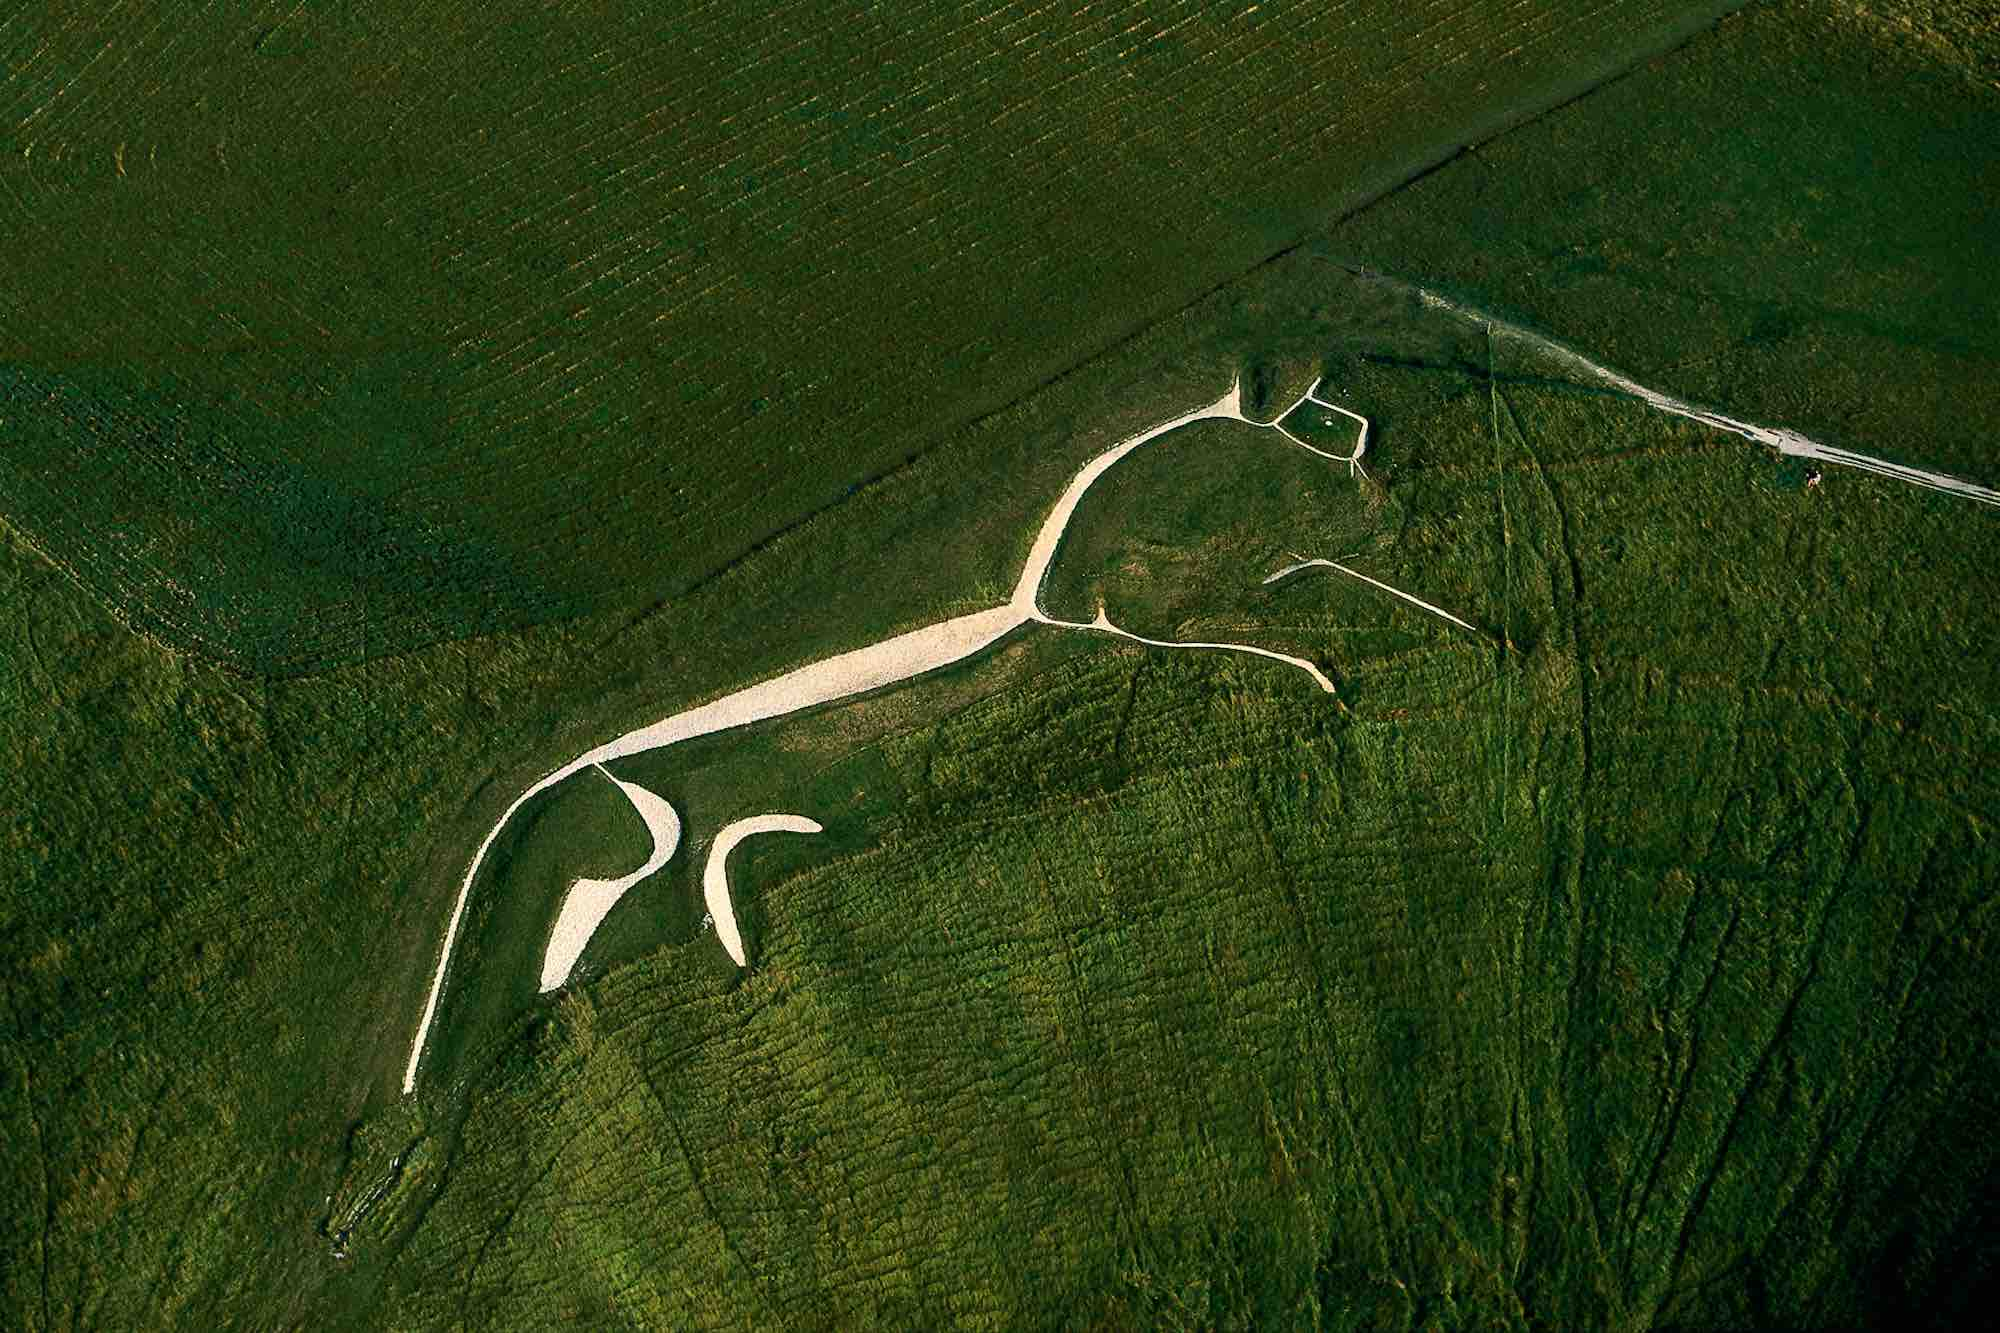 White horse - Yann Arthus-Bertrand